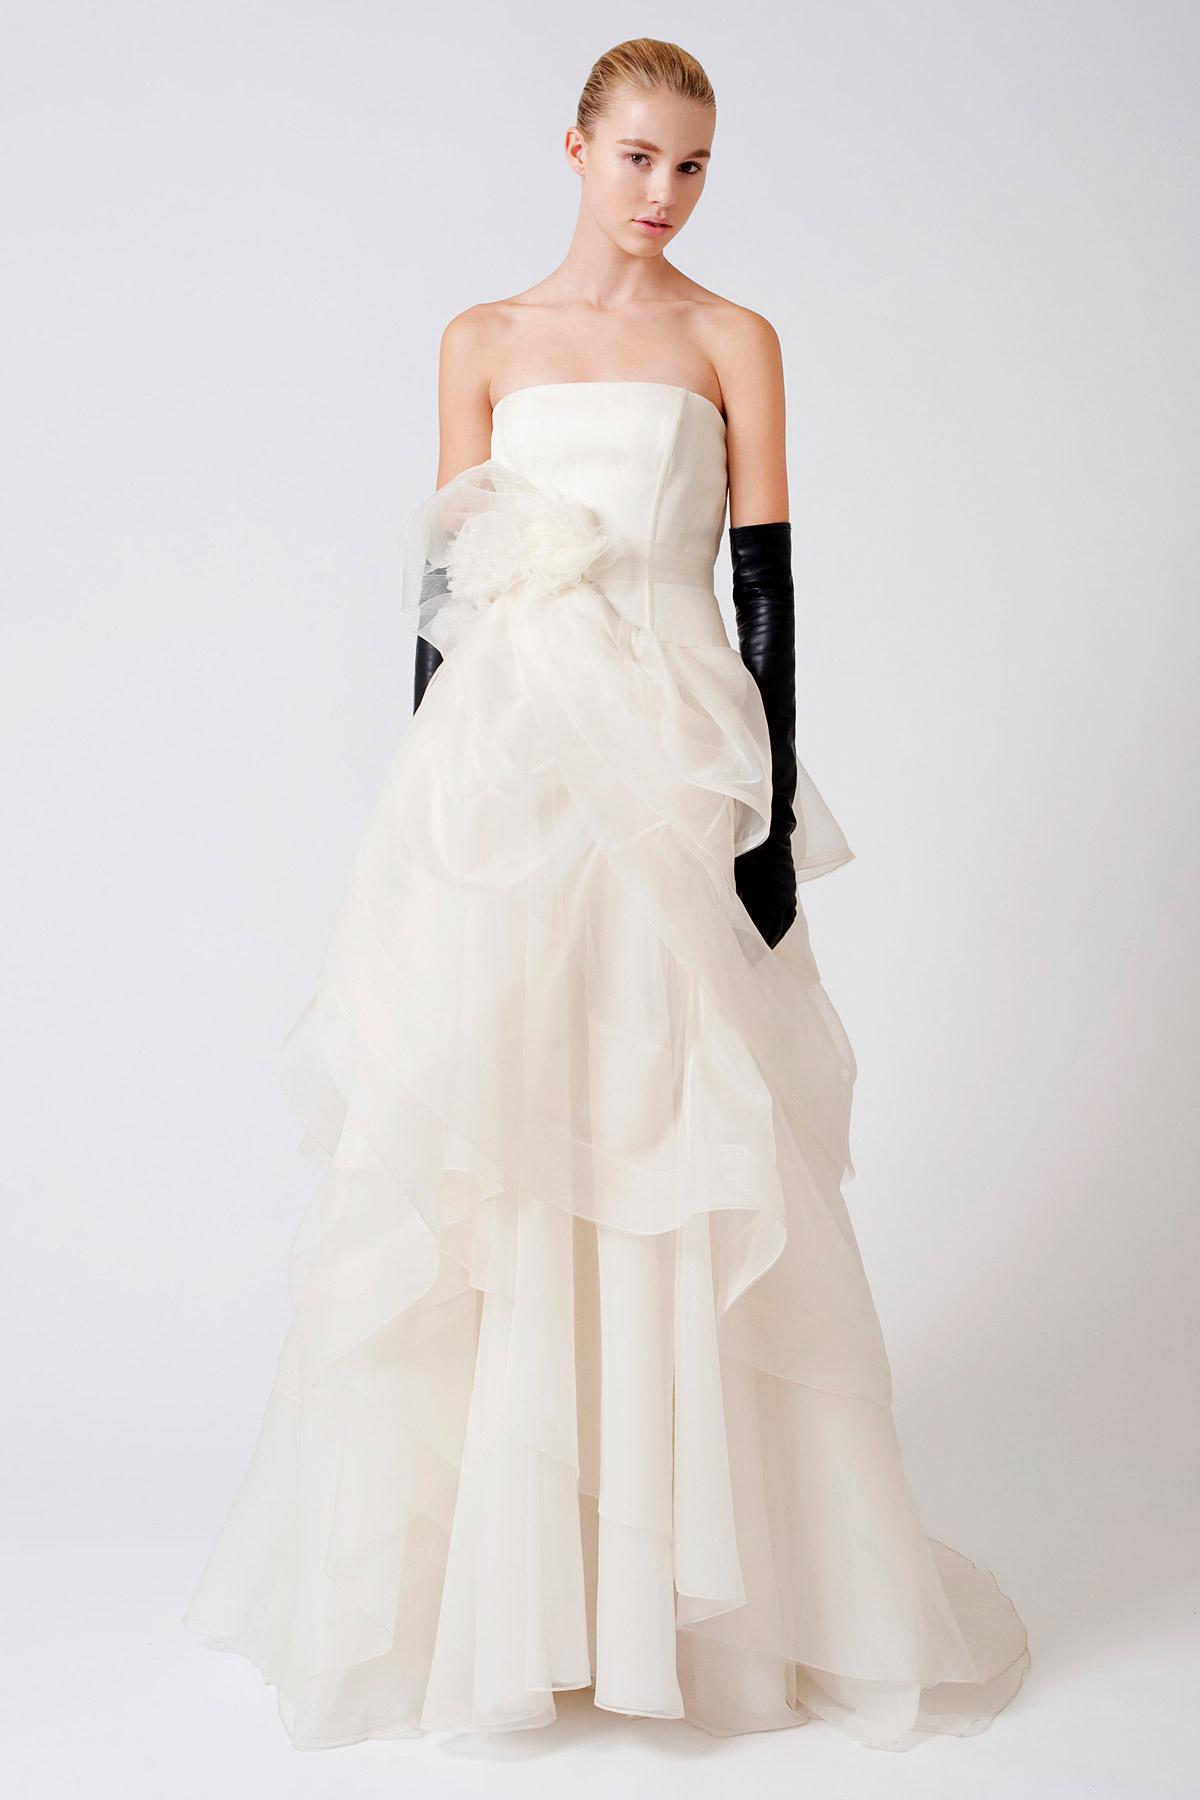 Wedding Dress Shops In San Francisco - Best Wedding Ideas 2017